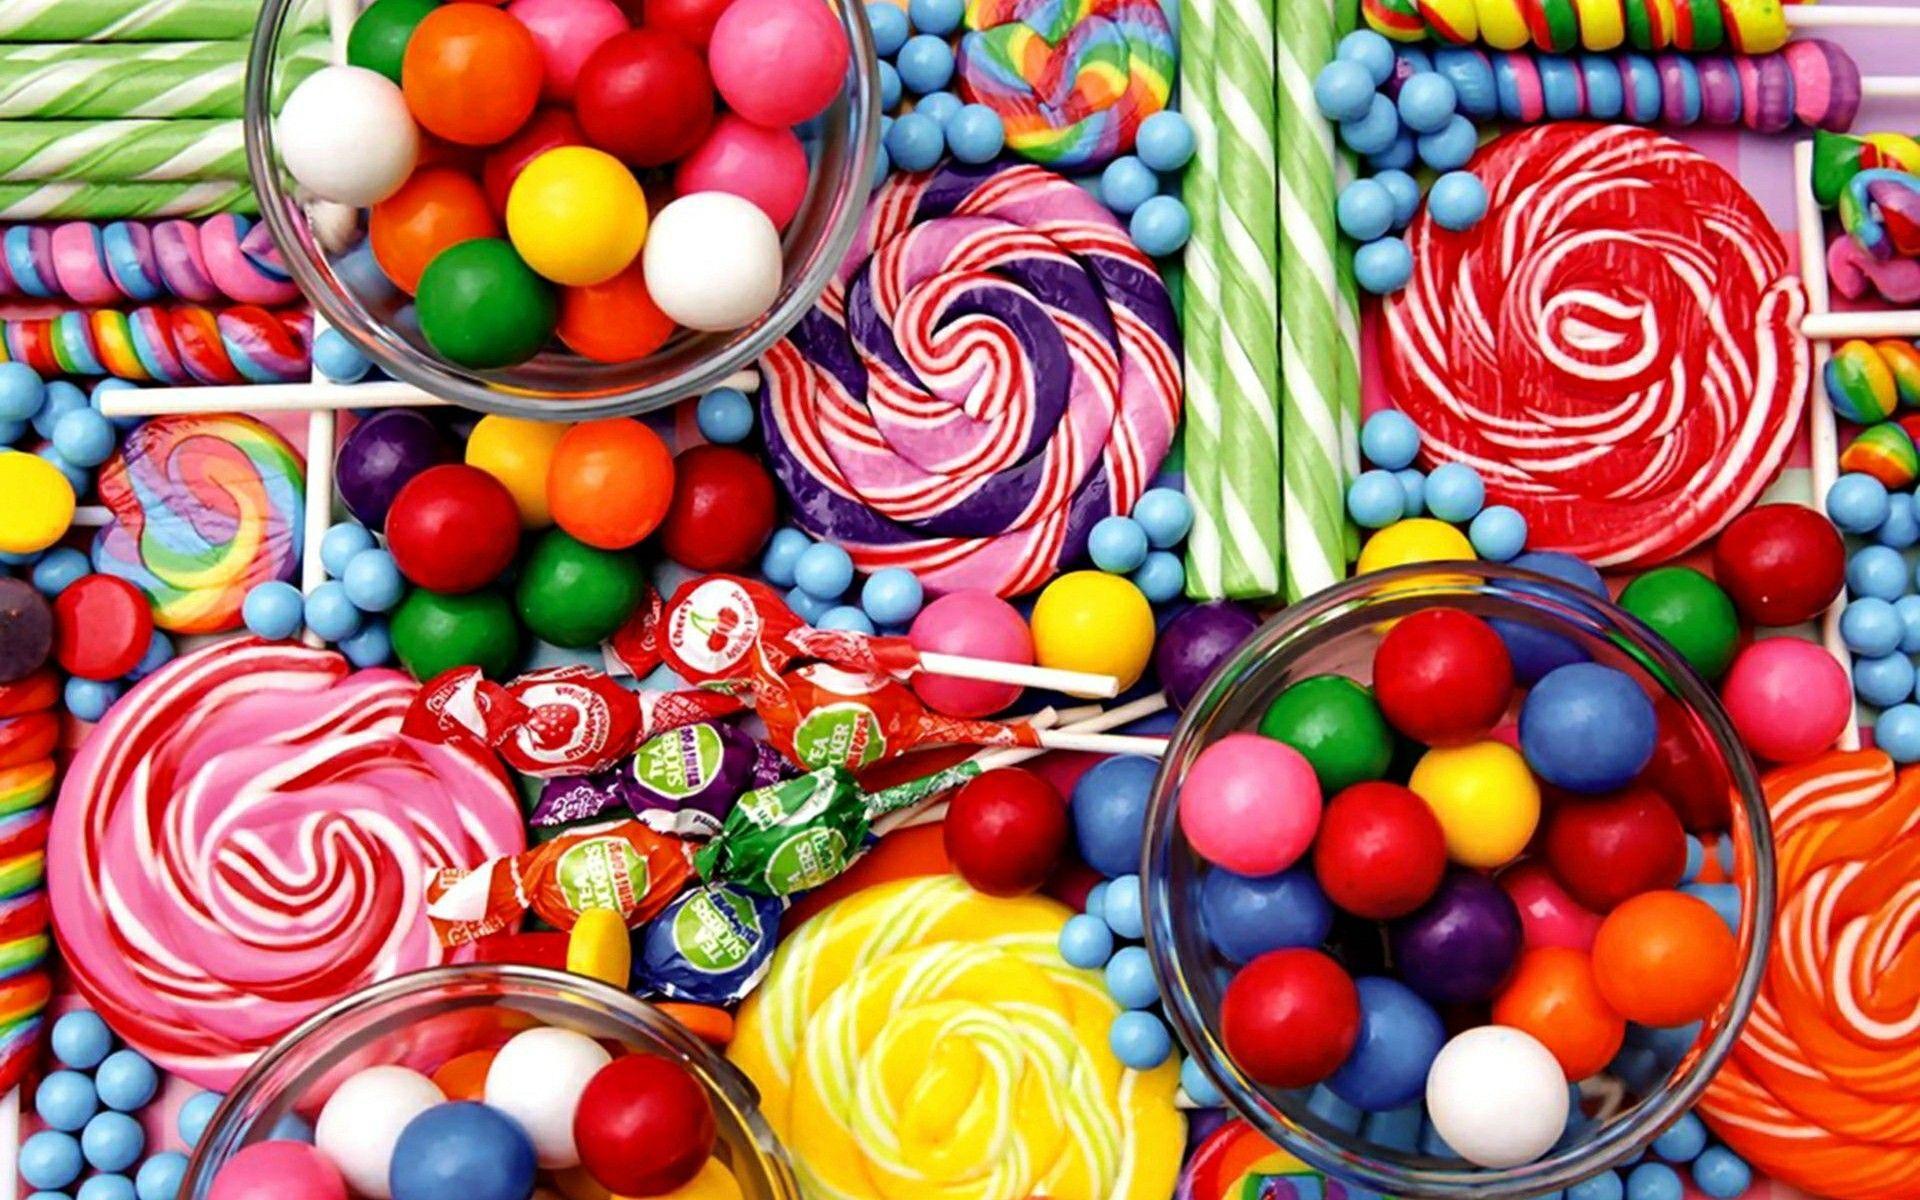 Fonds ecran bonbons page 2 for Ecran image